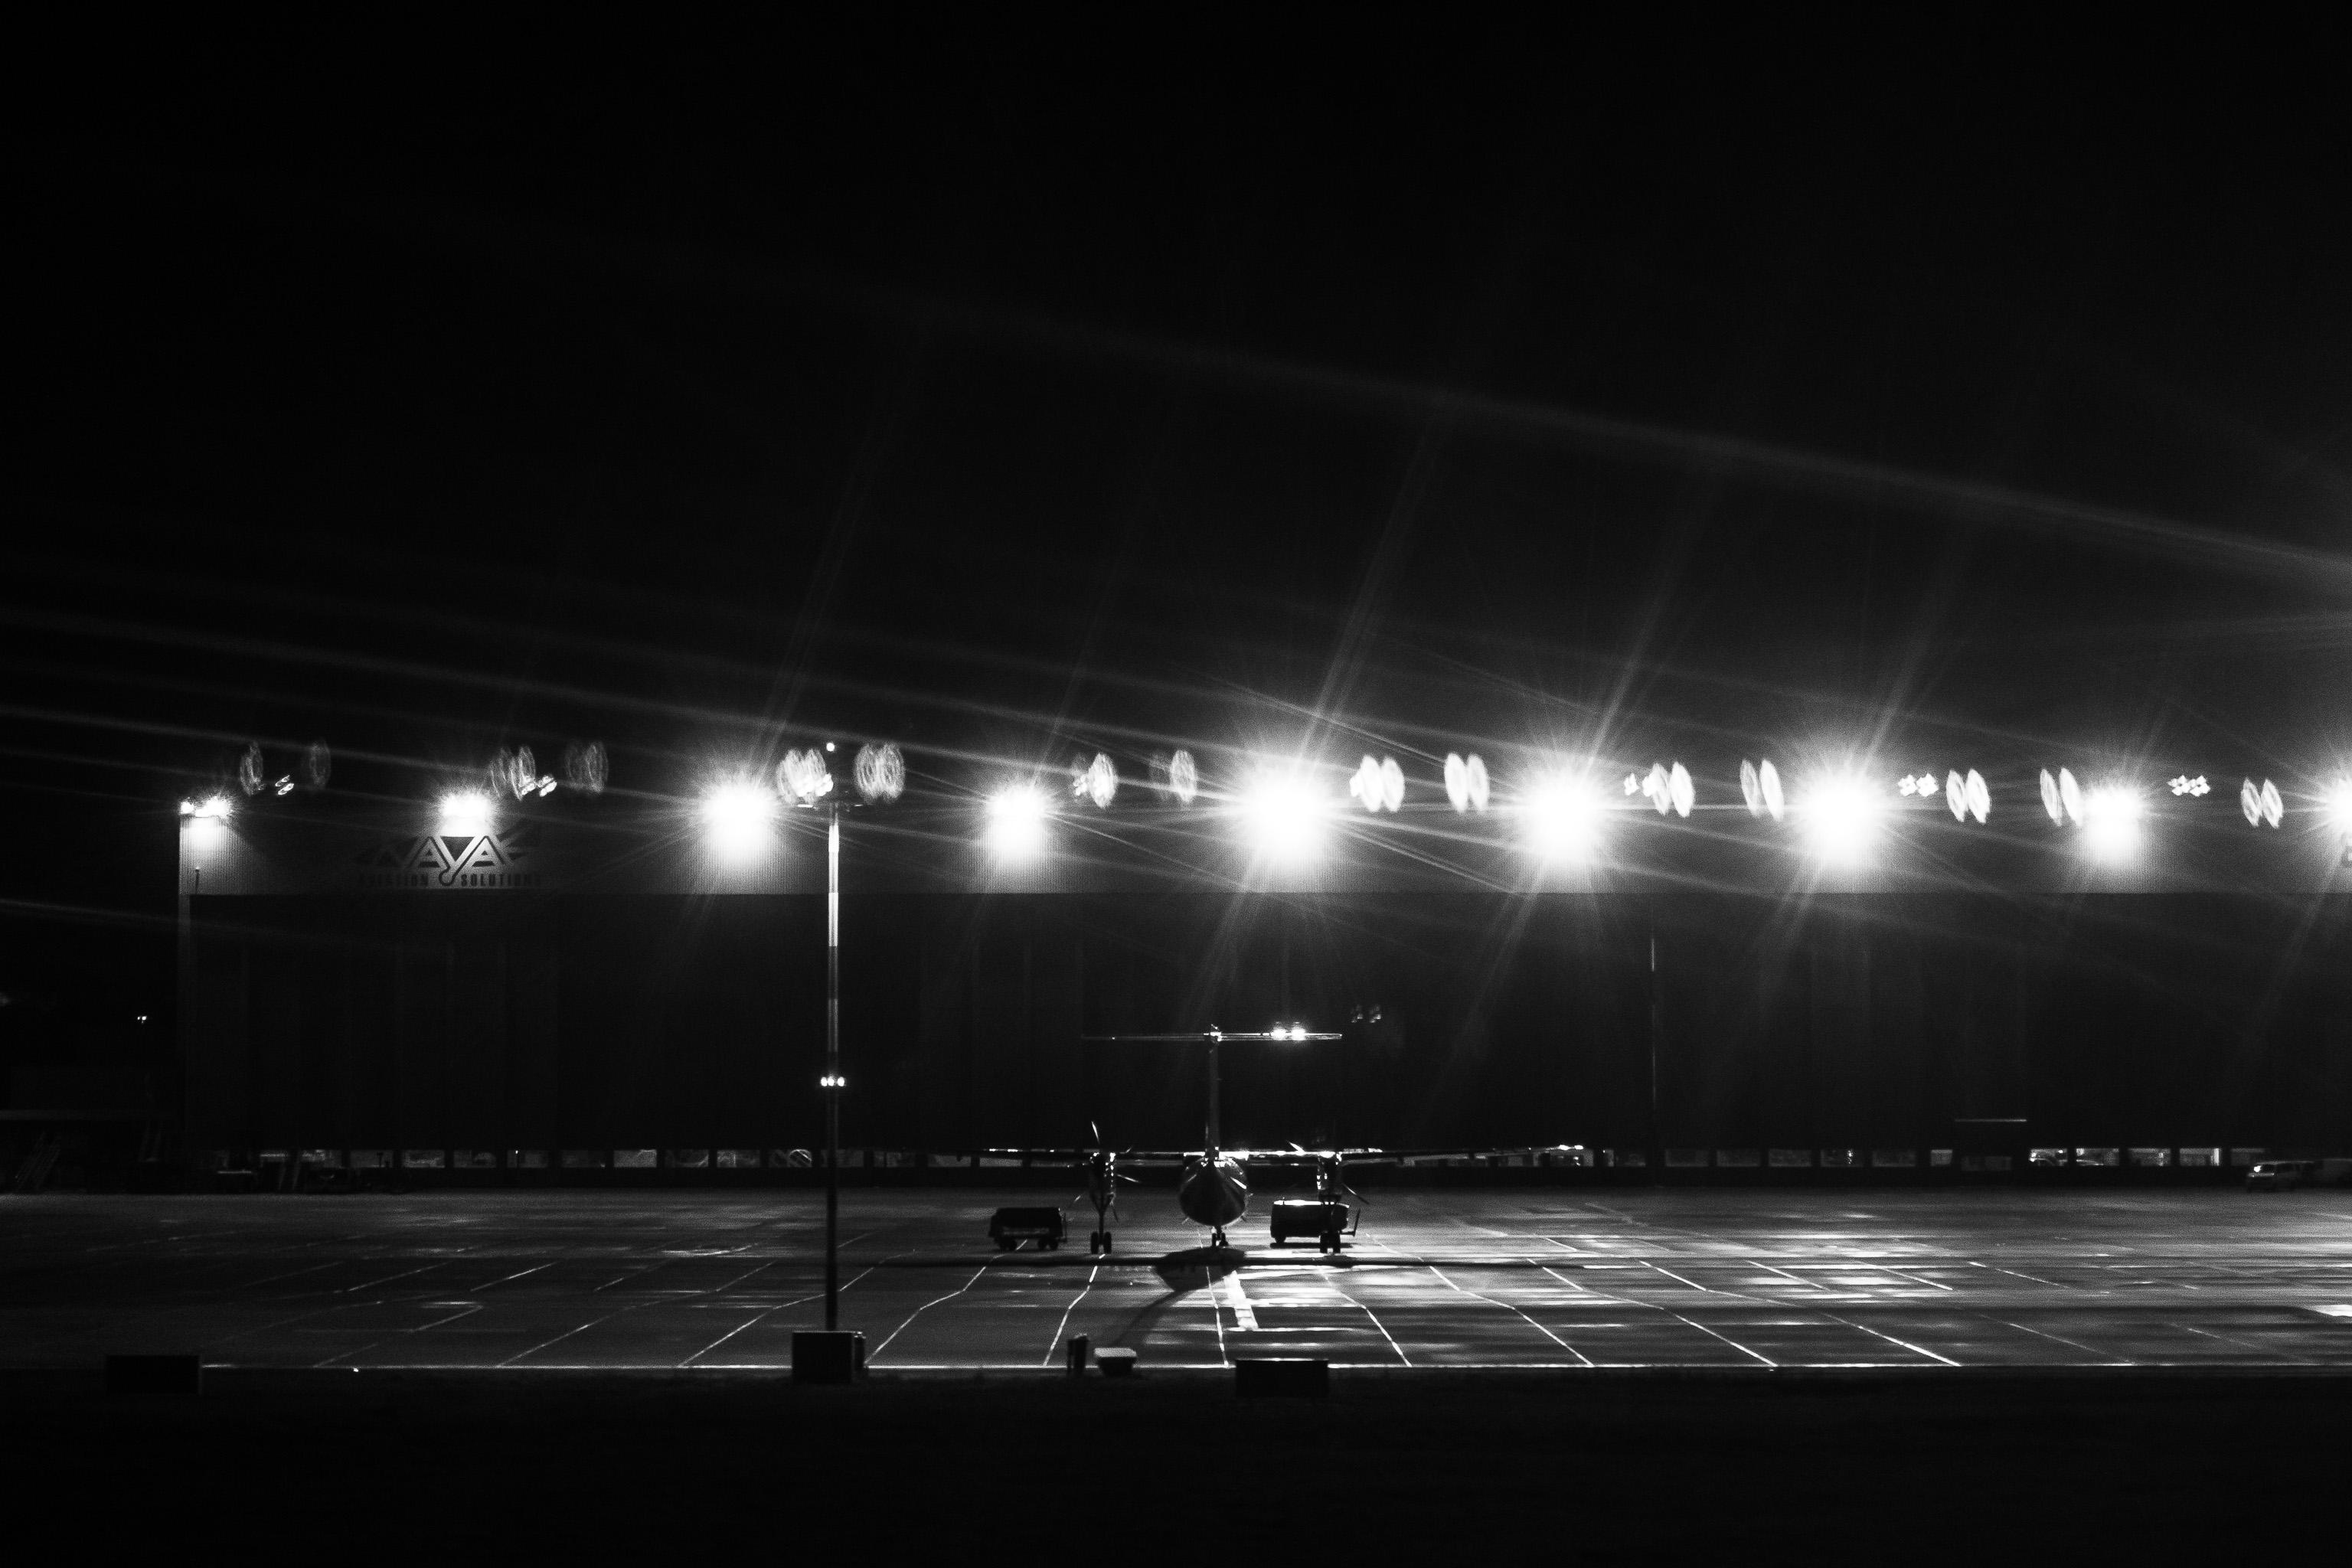 Vol de Nuit (05 von 16)